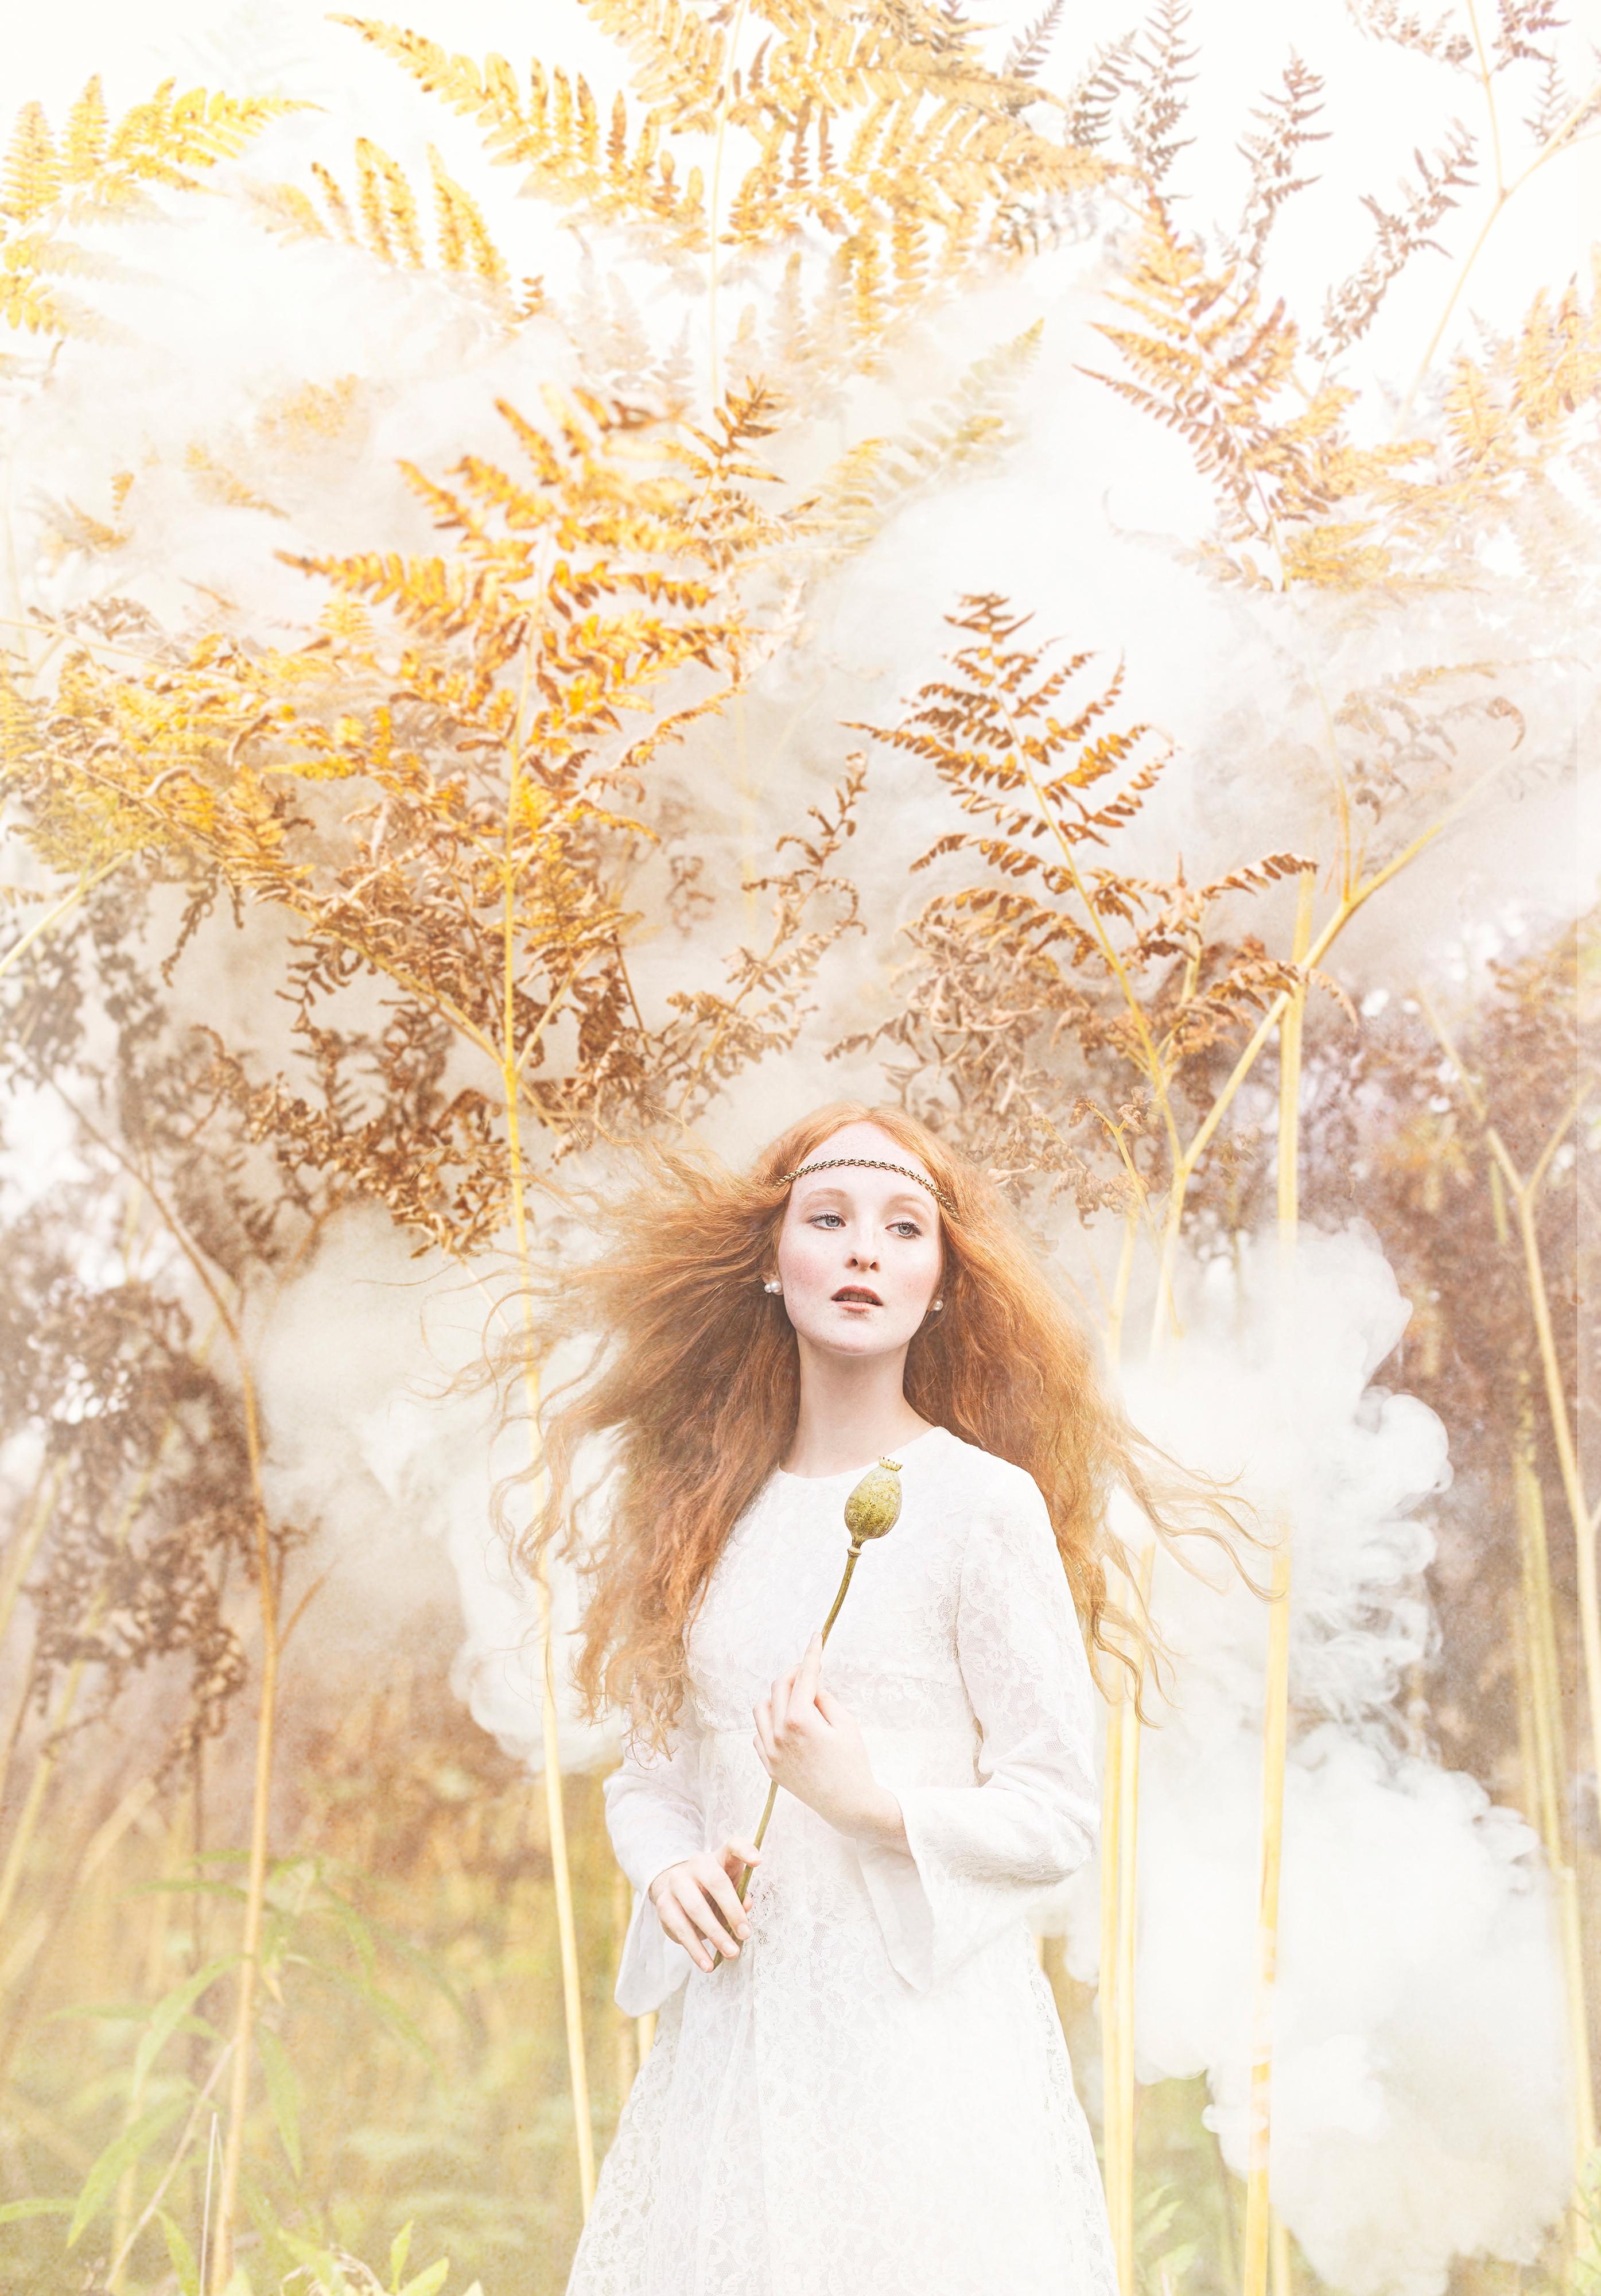 Porträtt_38_Fairytale_Forest